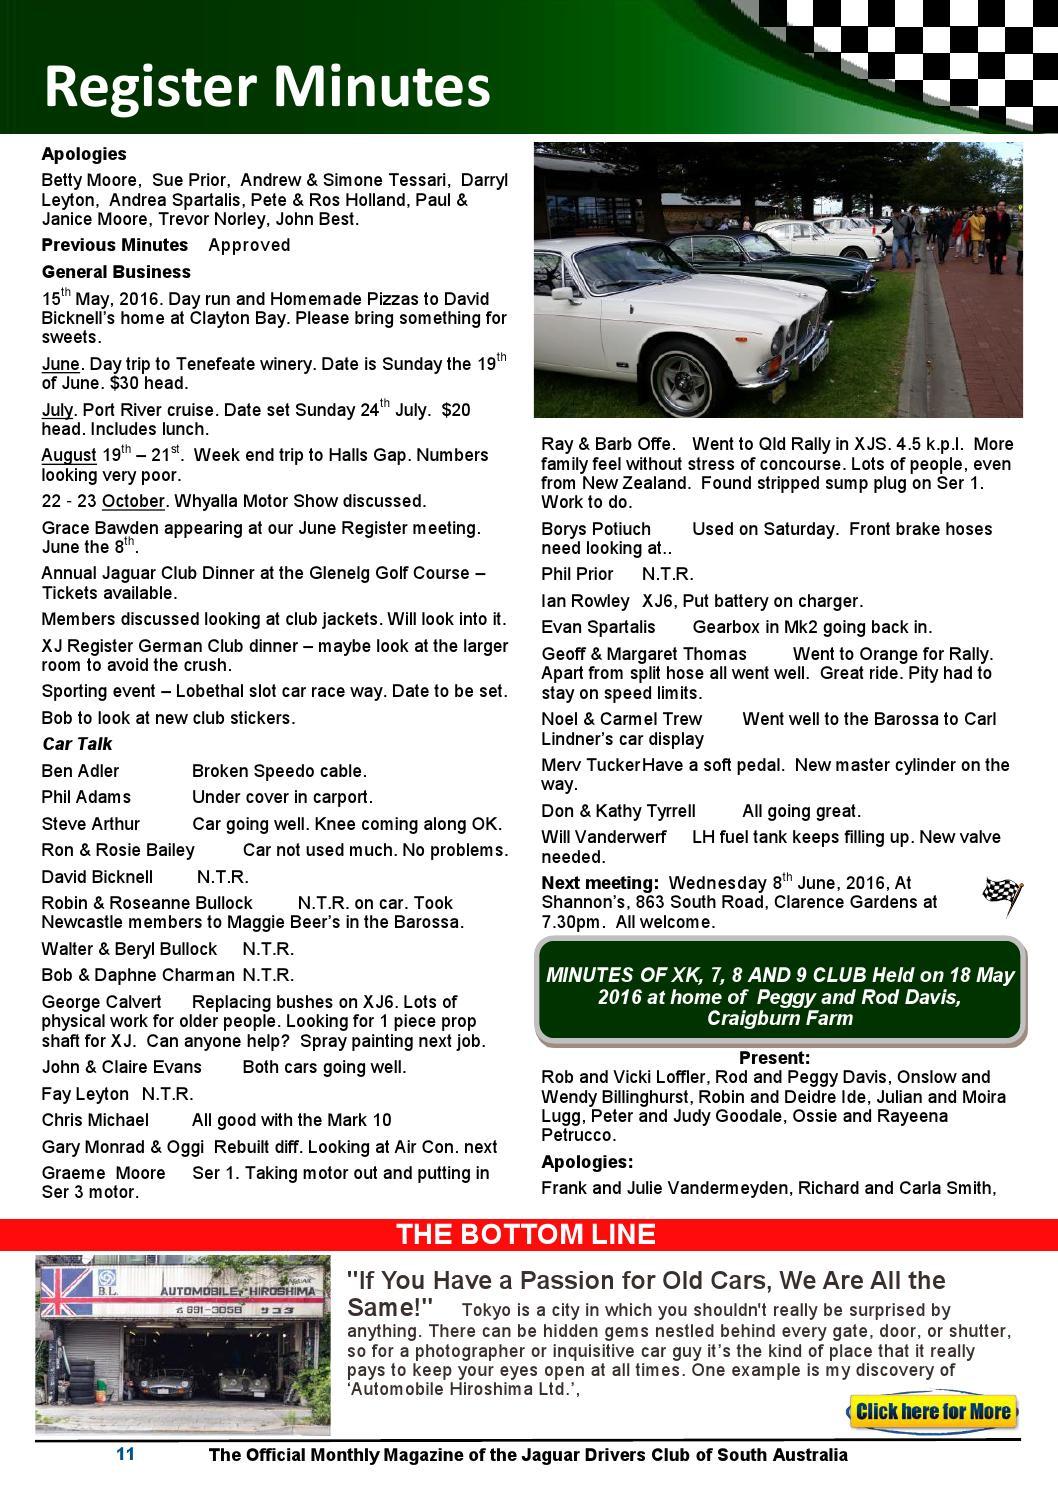 Classic marque june 2016 web by Jaguar Drivers Club of SA